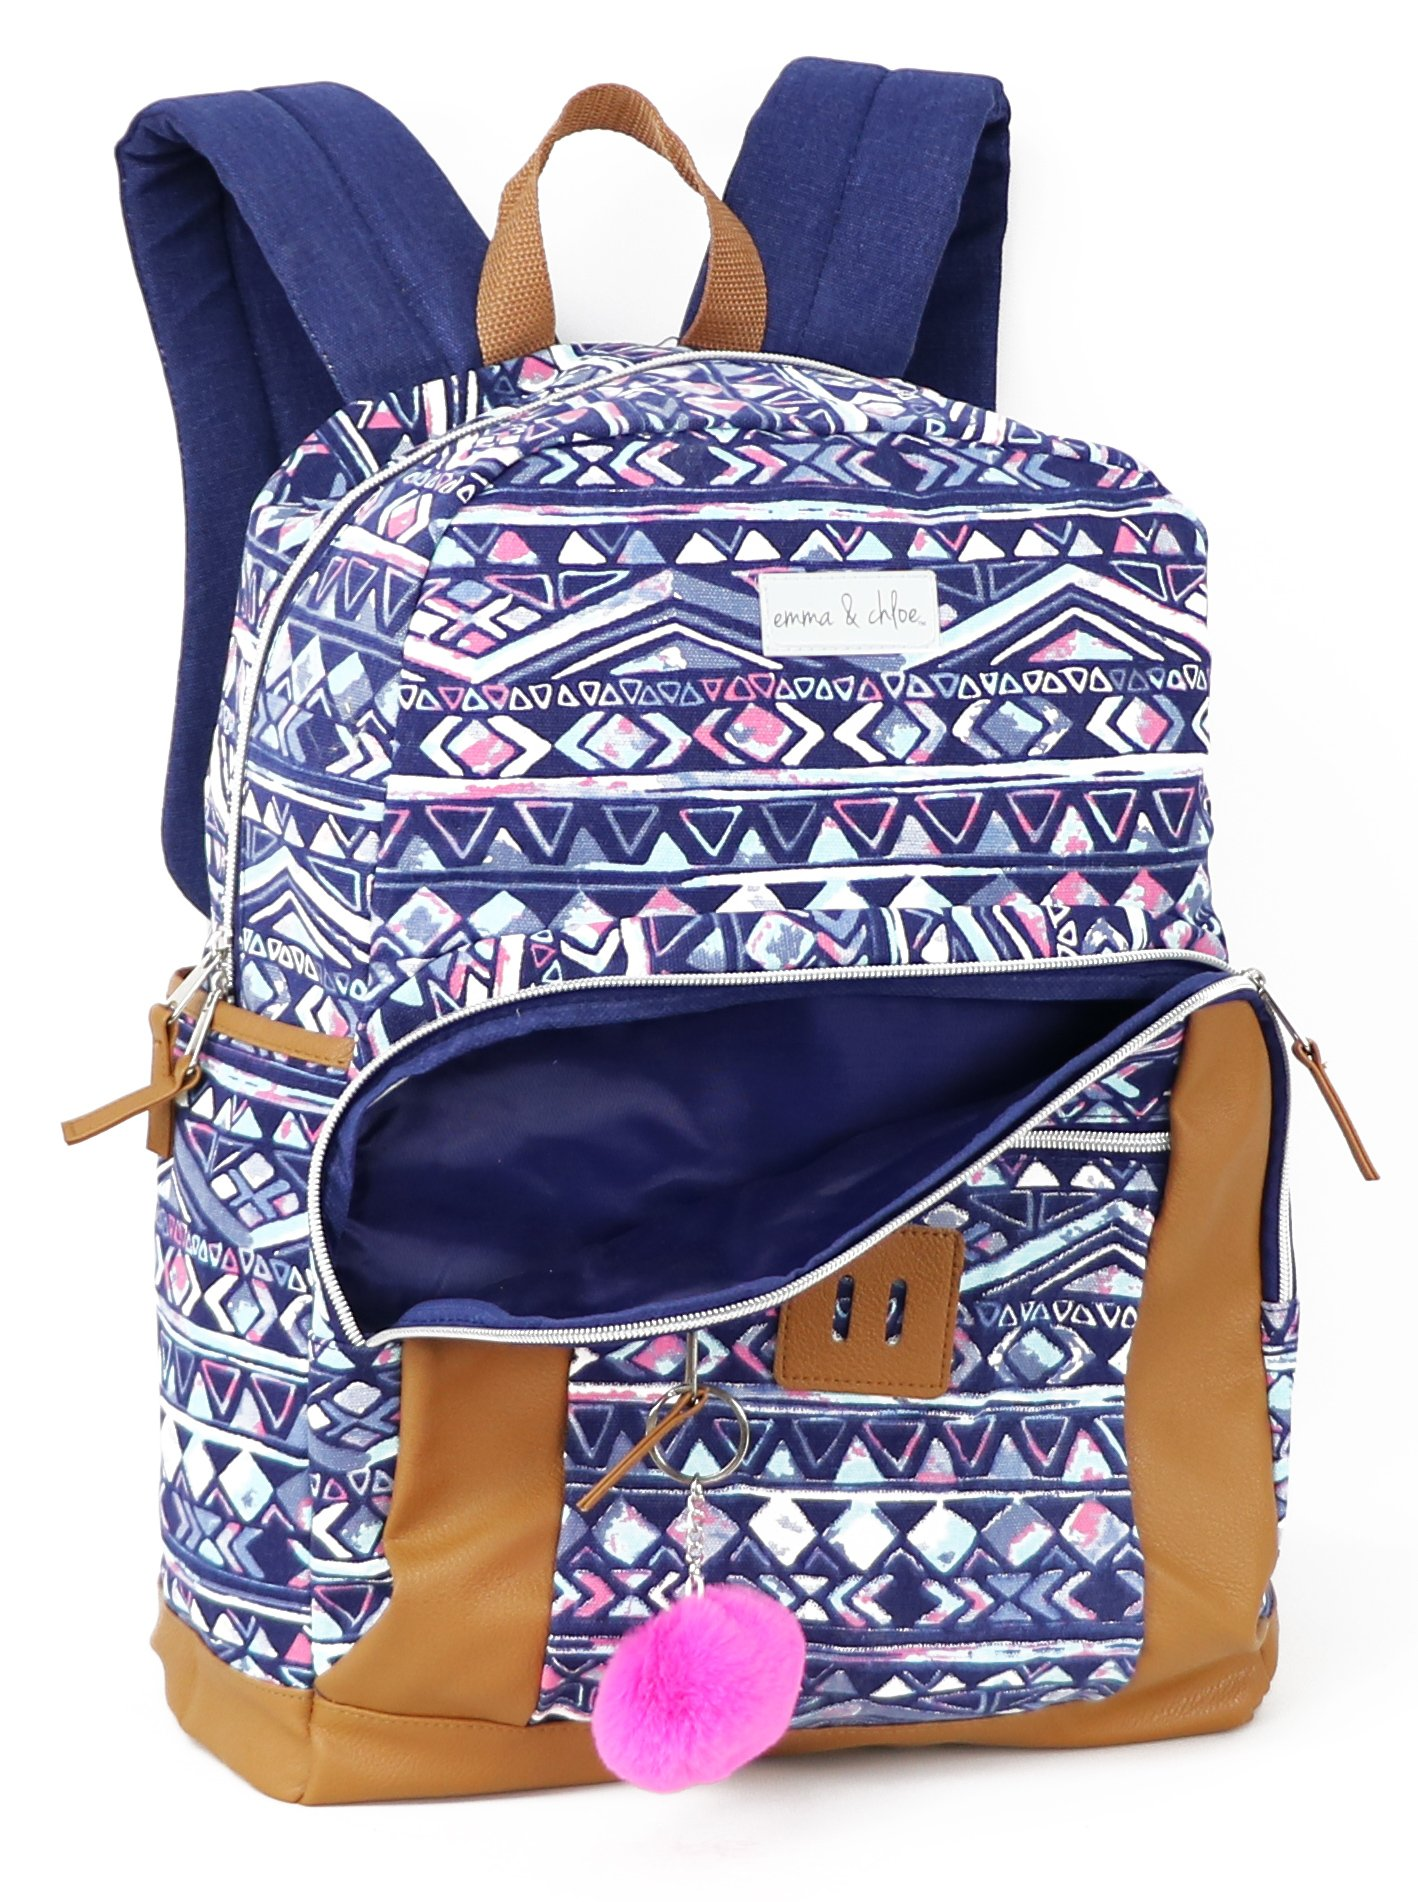 Emma & Chloe Girls Aztec Pom-Pom Vinyl-Base Cotton Backpack (One Size, Aztec Navy) by Trail maker (Image #2)